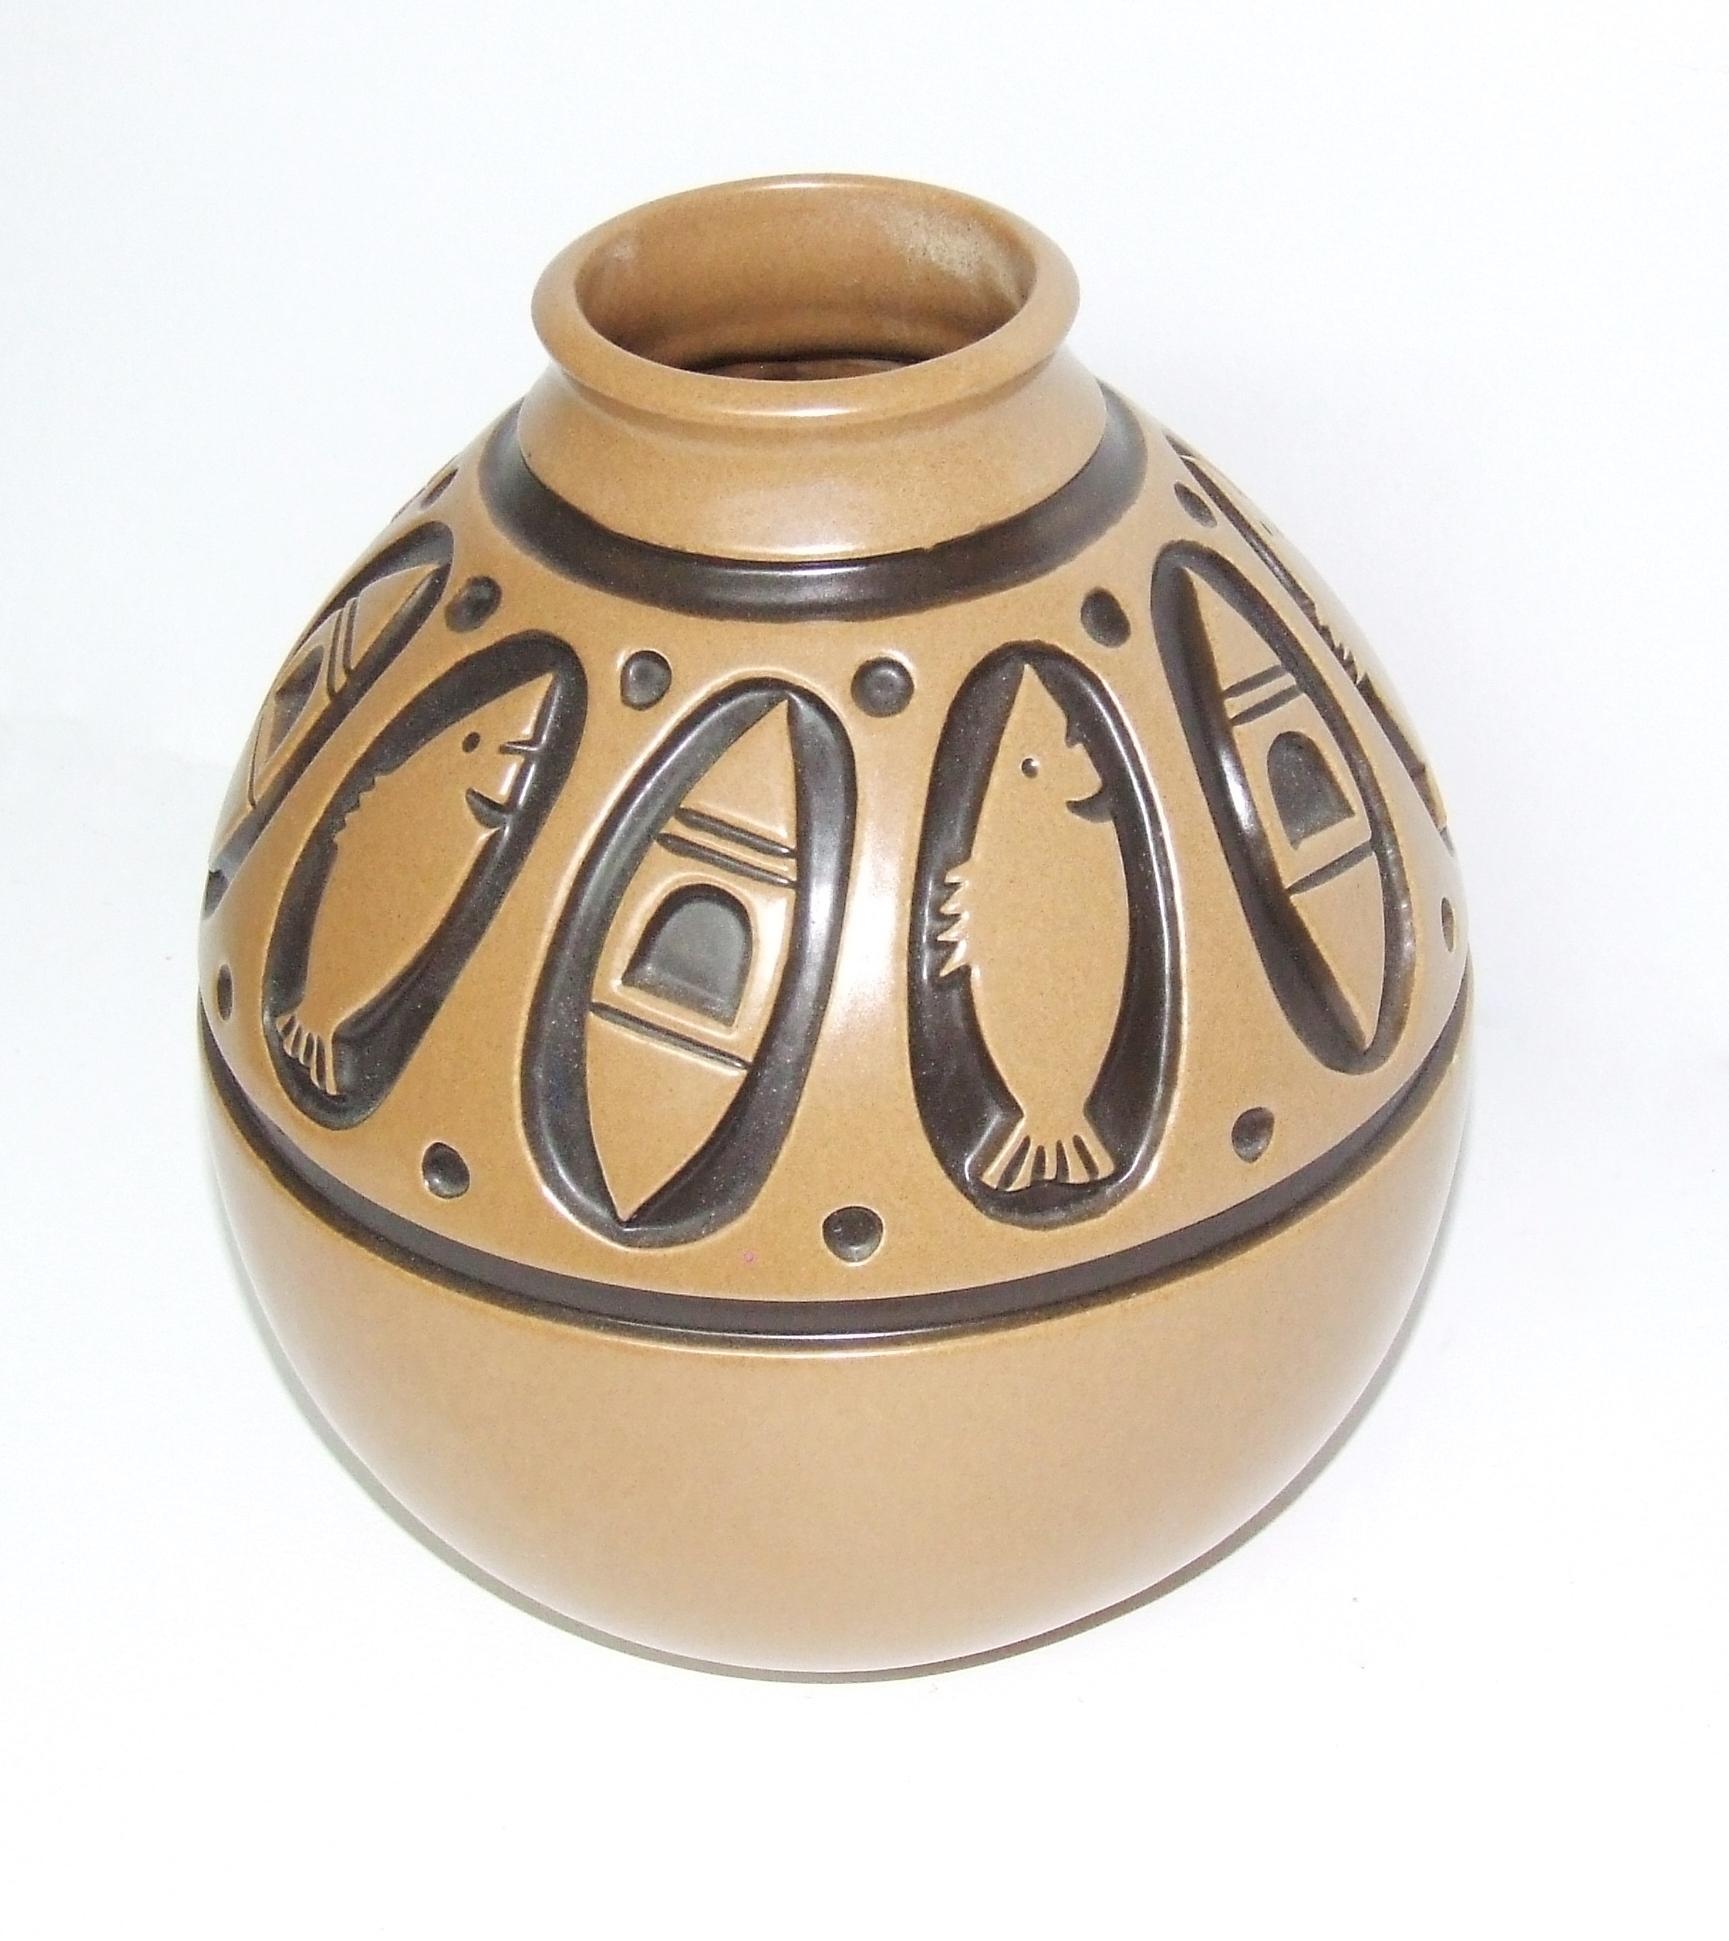 Vase from the Skimo series circa 1972.